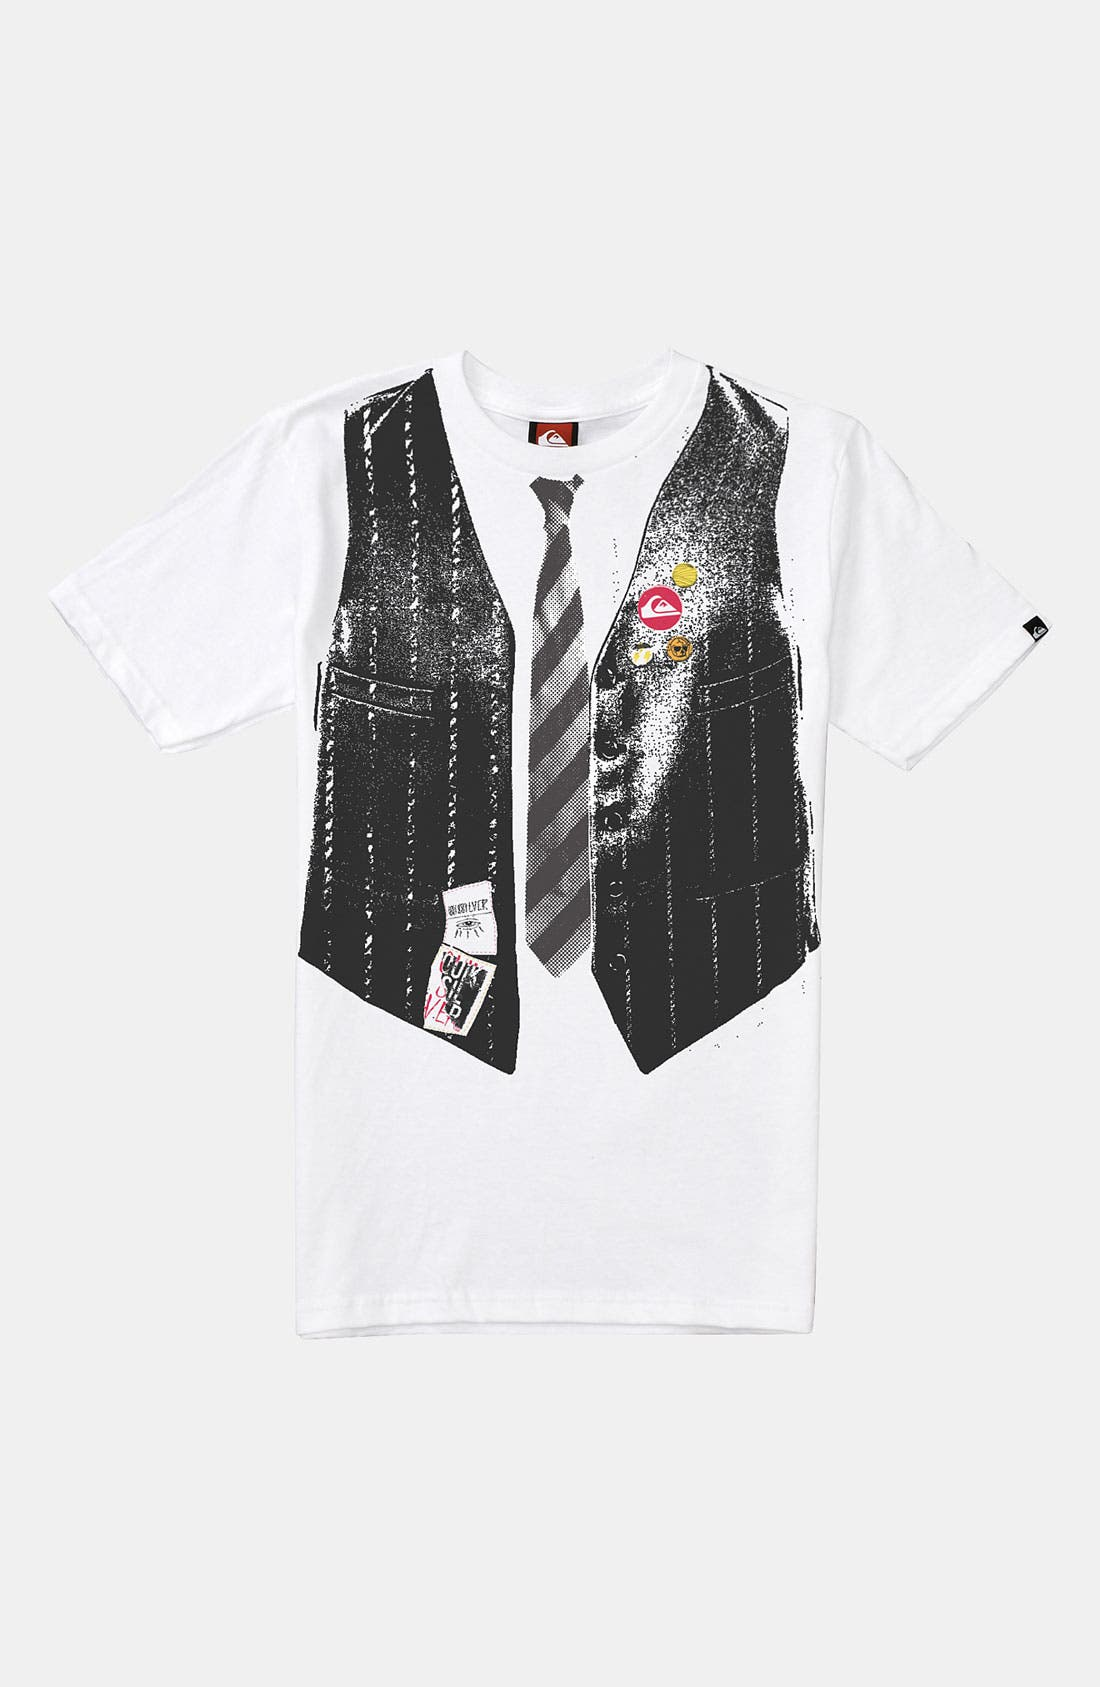 Alternate Image 1 Selected - Quiksilver 'Big Night Out' Screenprint T-Shirt (Big Boys)